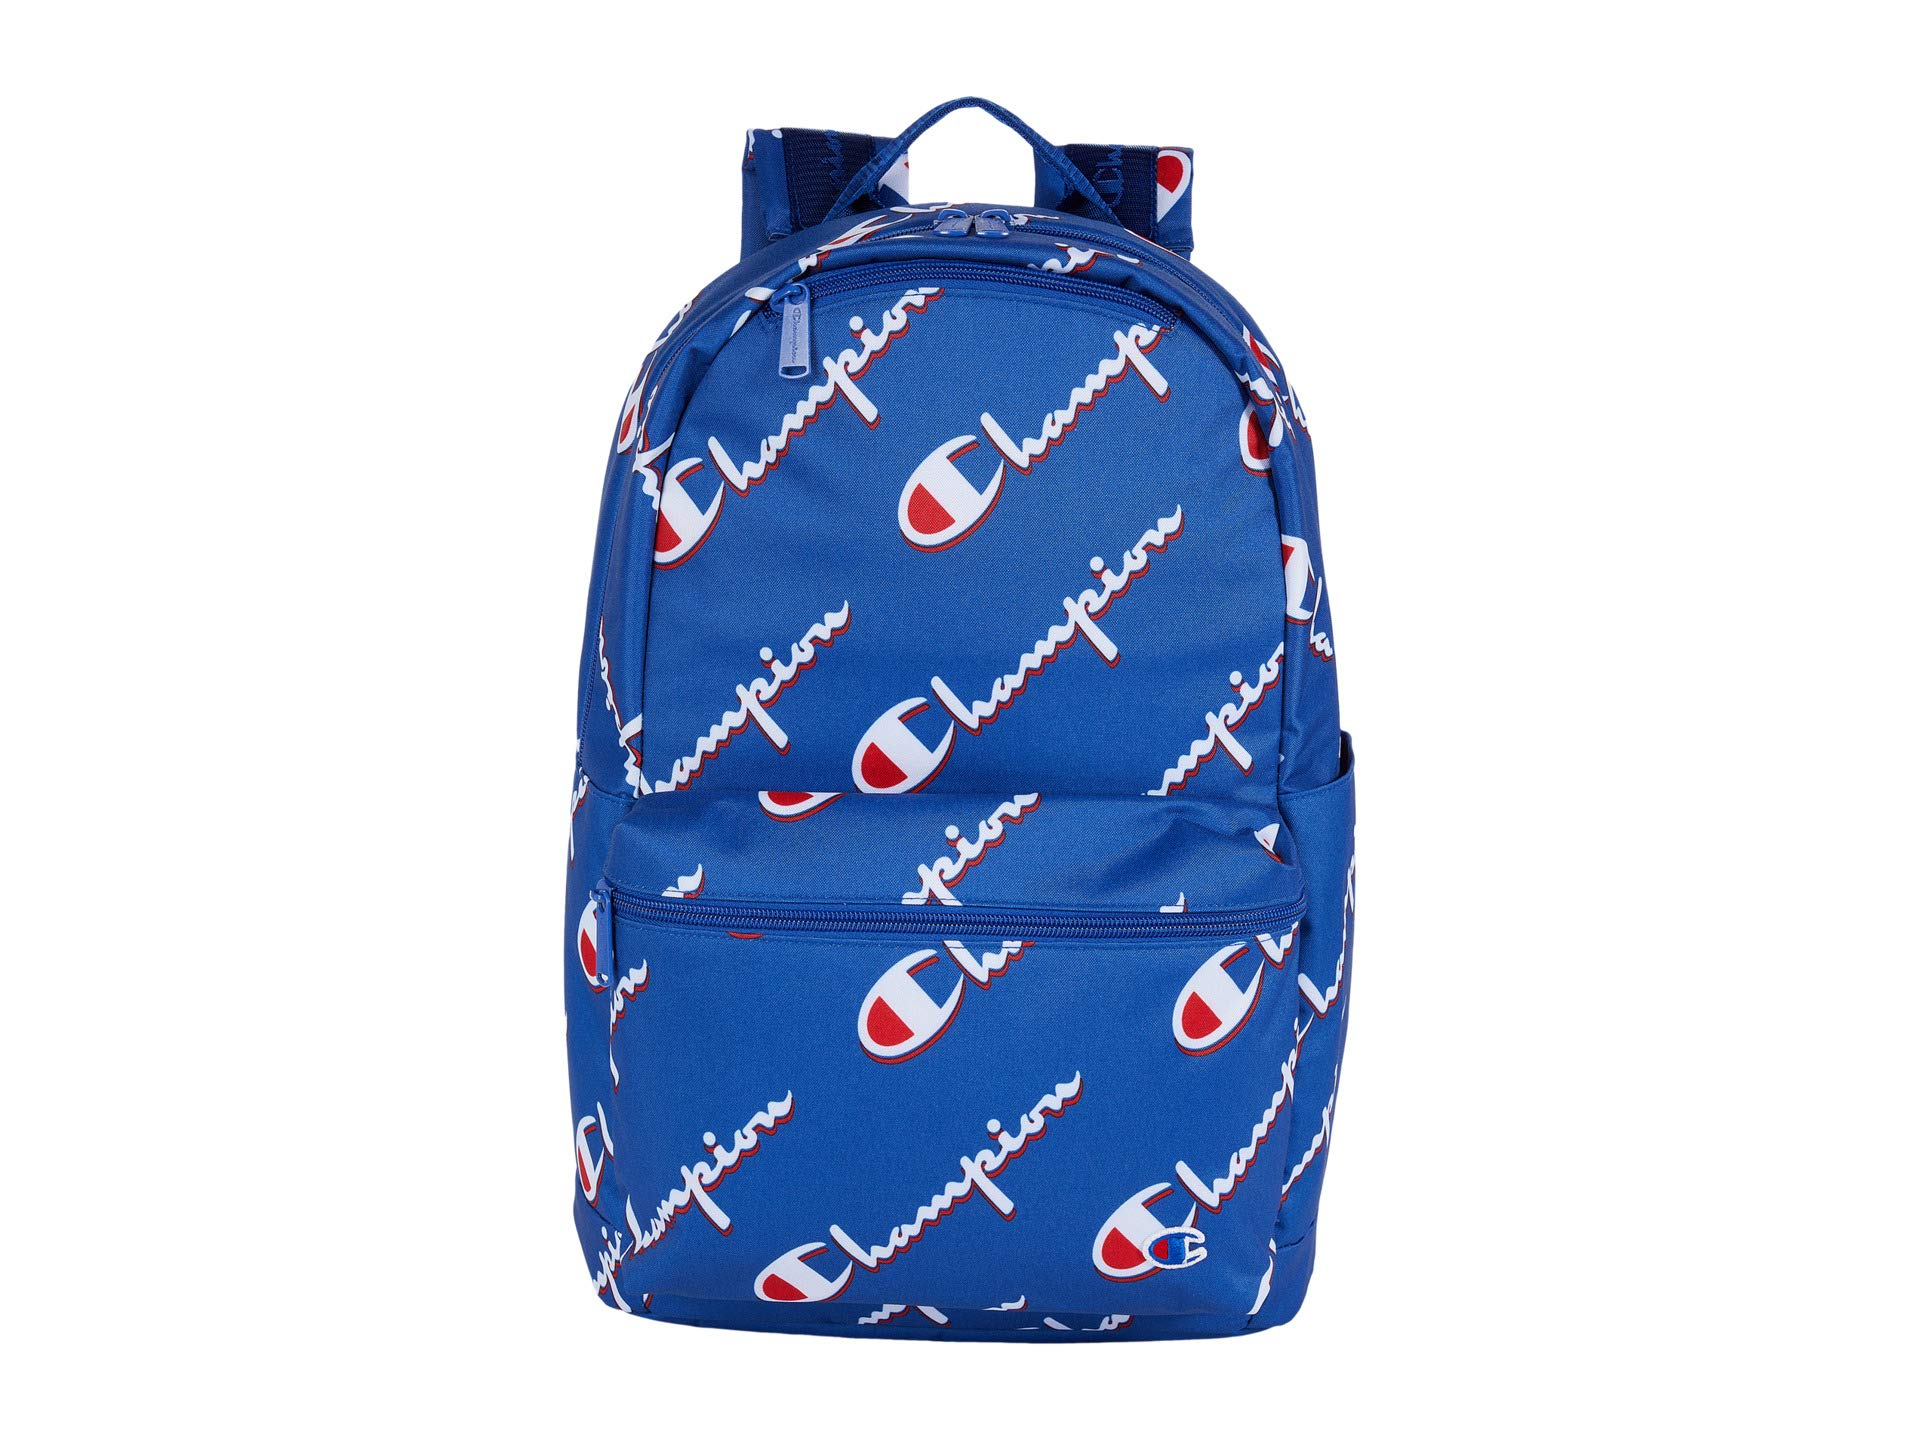 Champion LIFE Champion LIFE Supercize 3.0 Backpack